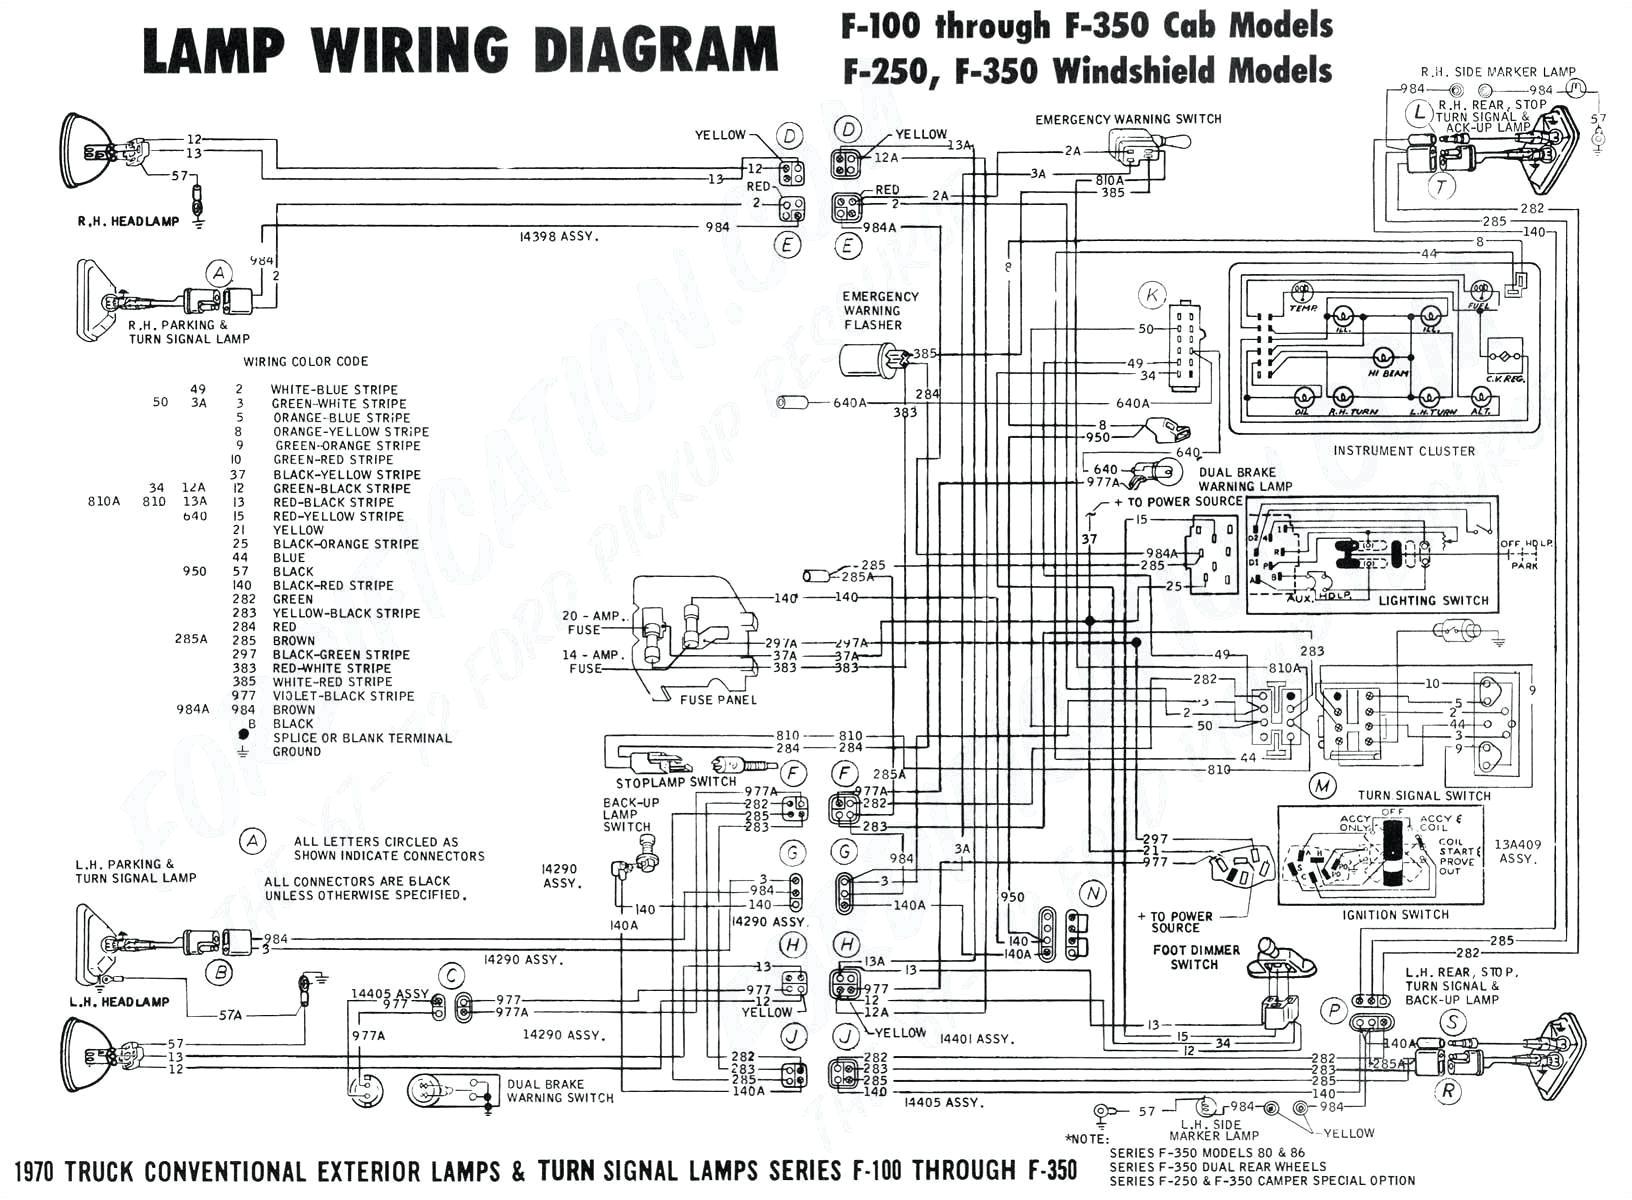 2003 Gmc Sierra Trailer Wiring Diagram Wiring Diagram for 1979 Chevy Silverado as Well as Trailer Wiring